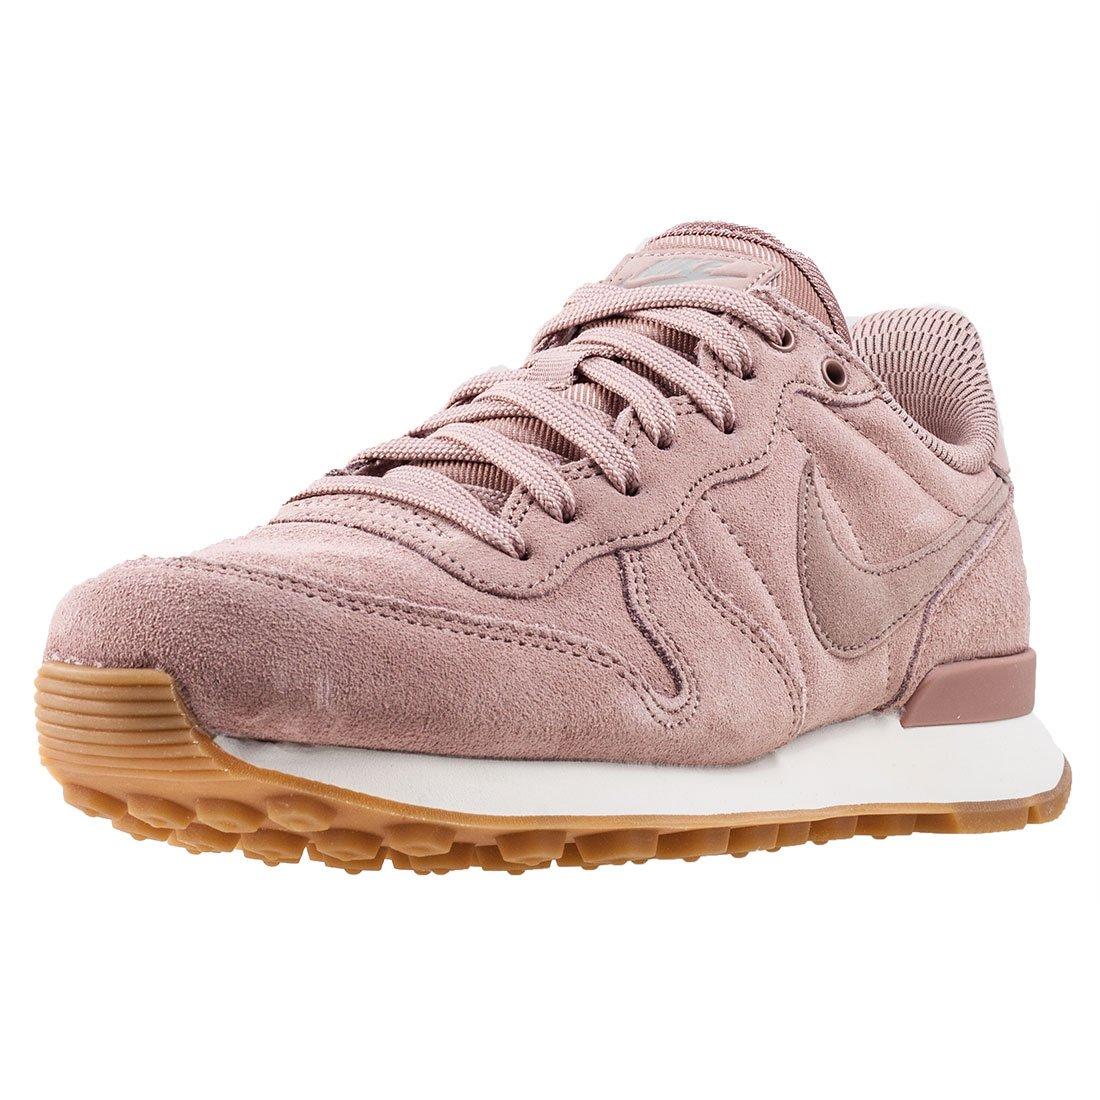 Nike Internationalist Se Womens Trainers Pink  Amazon.co.uk  Shoes   Bags 16e5b0ce0254